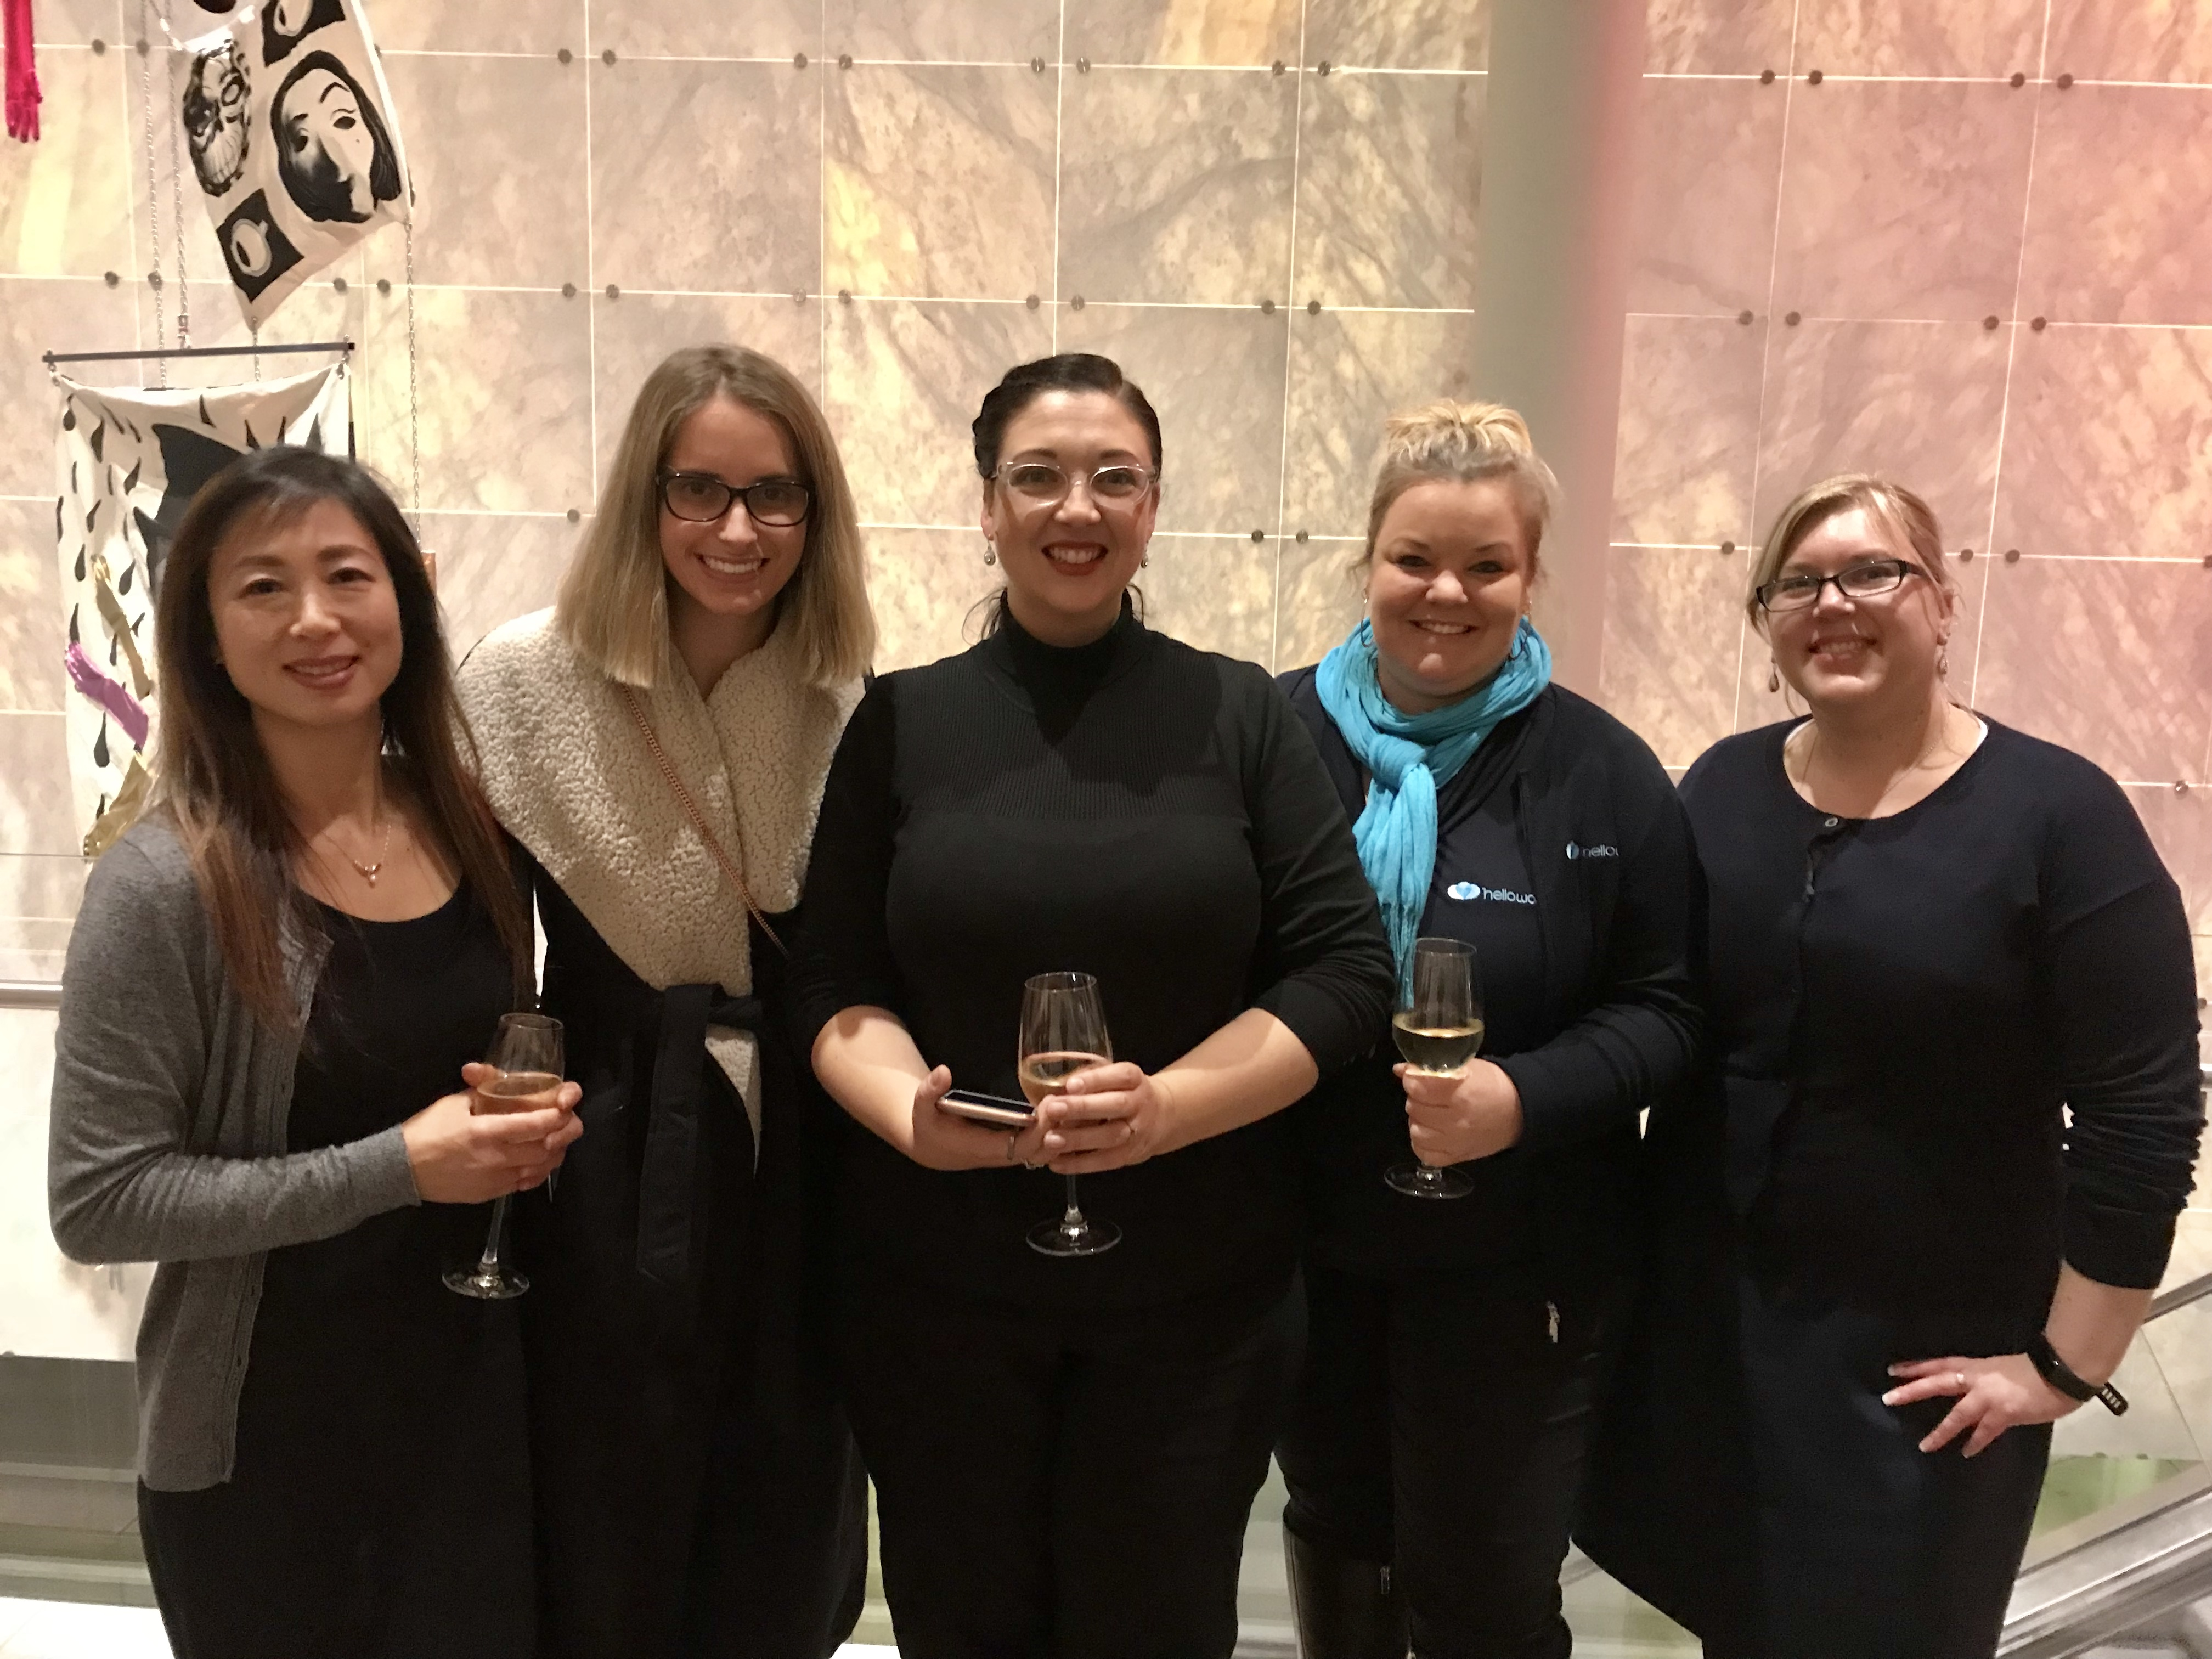 Pictured L-R: Anna Caldrmoska and Kaye Gray – Helloworld Travel Belconnen, Sonya Webb – Helloworld Travel Goulburn